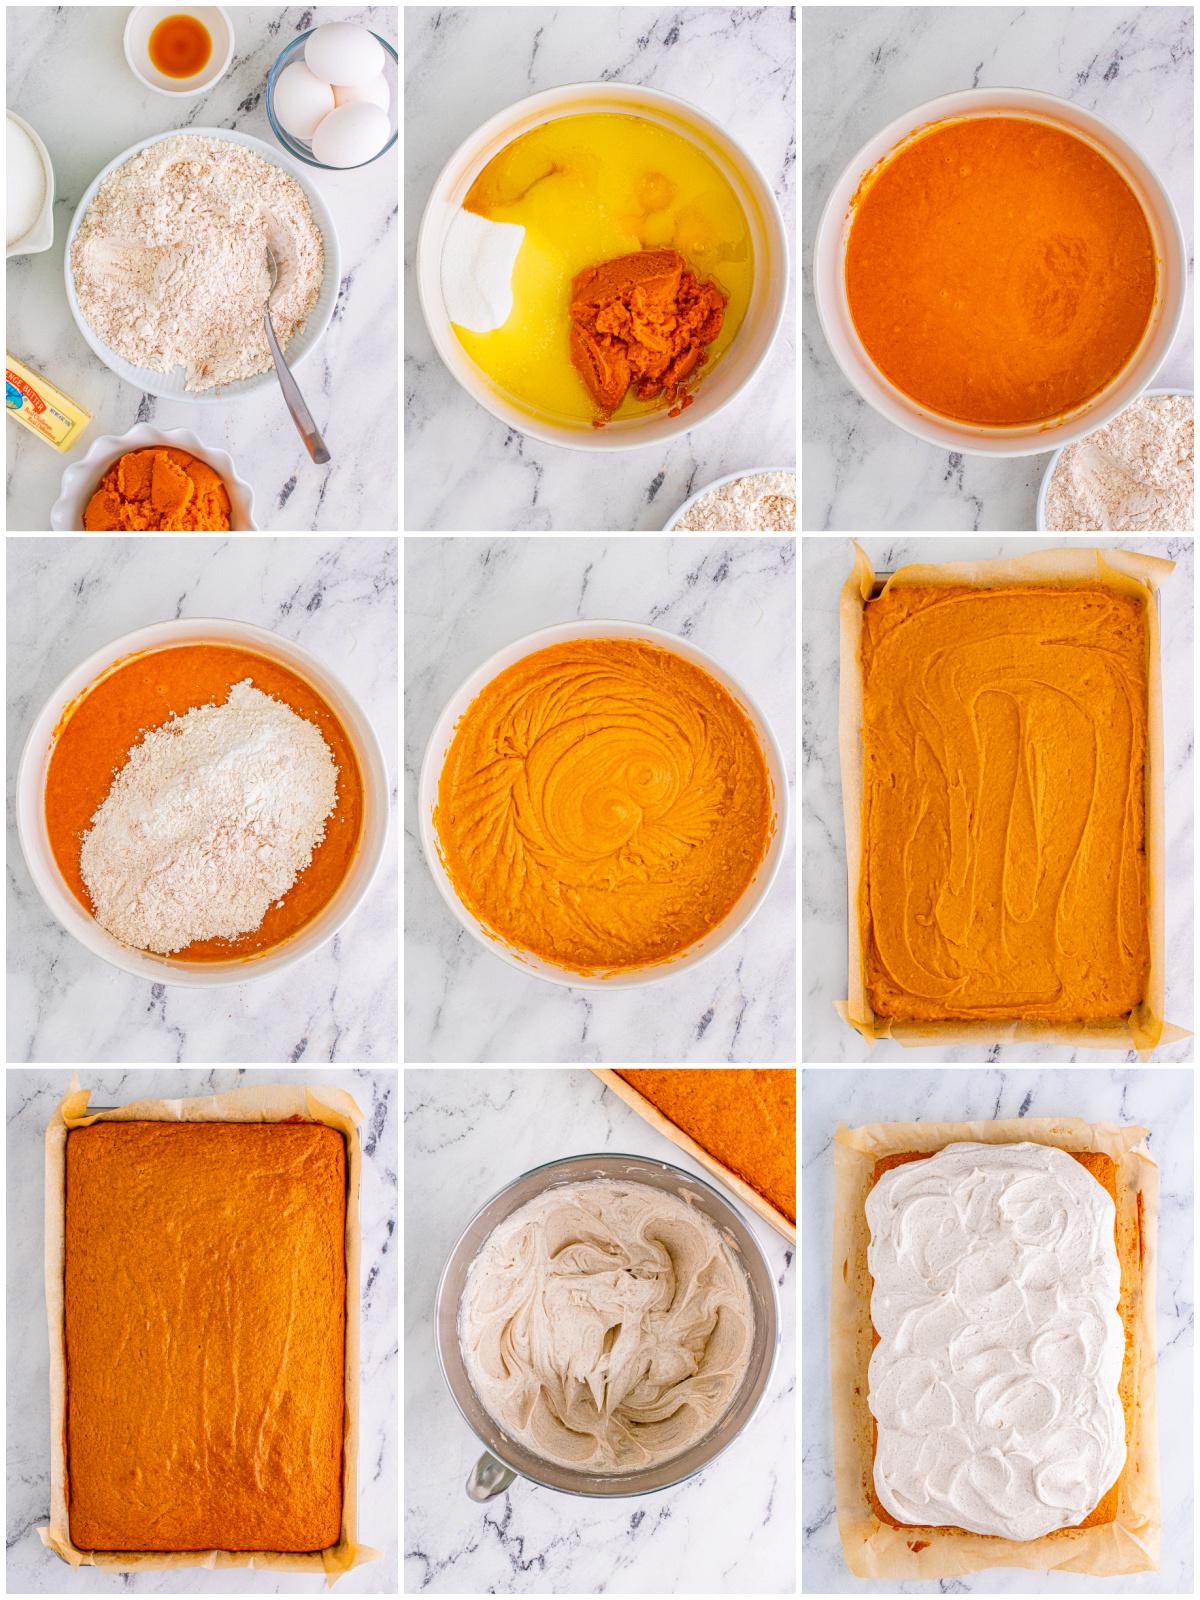 Step by step photos on how to make a Pumpkin Bar Recipe